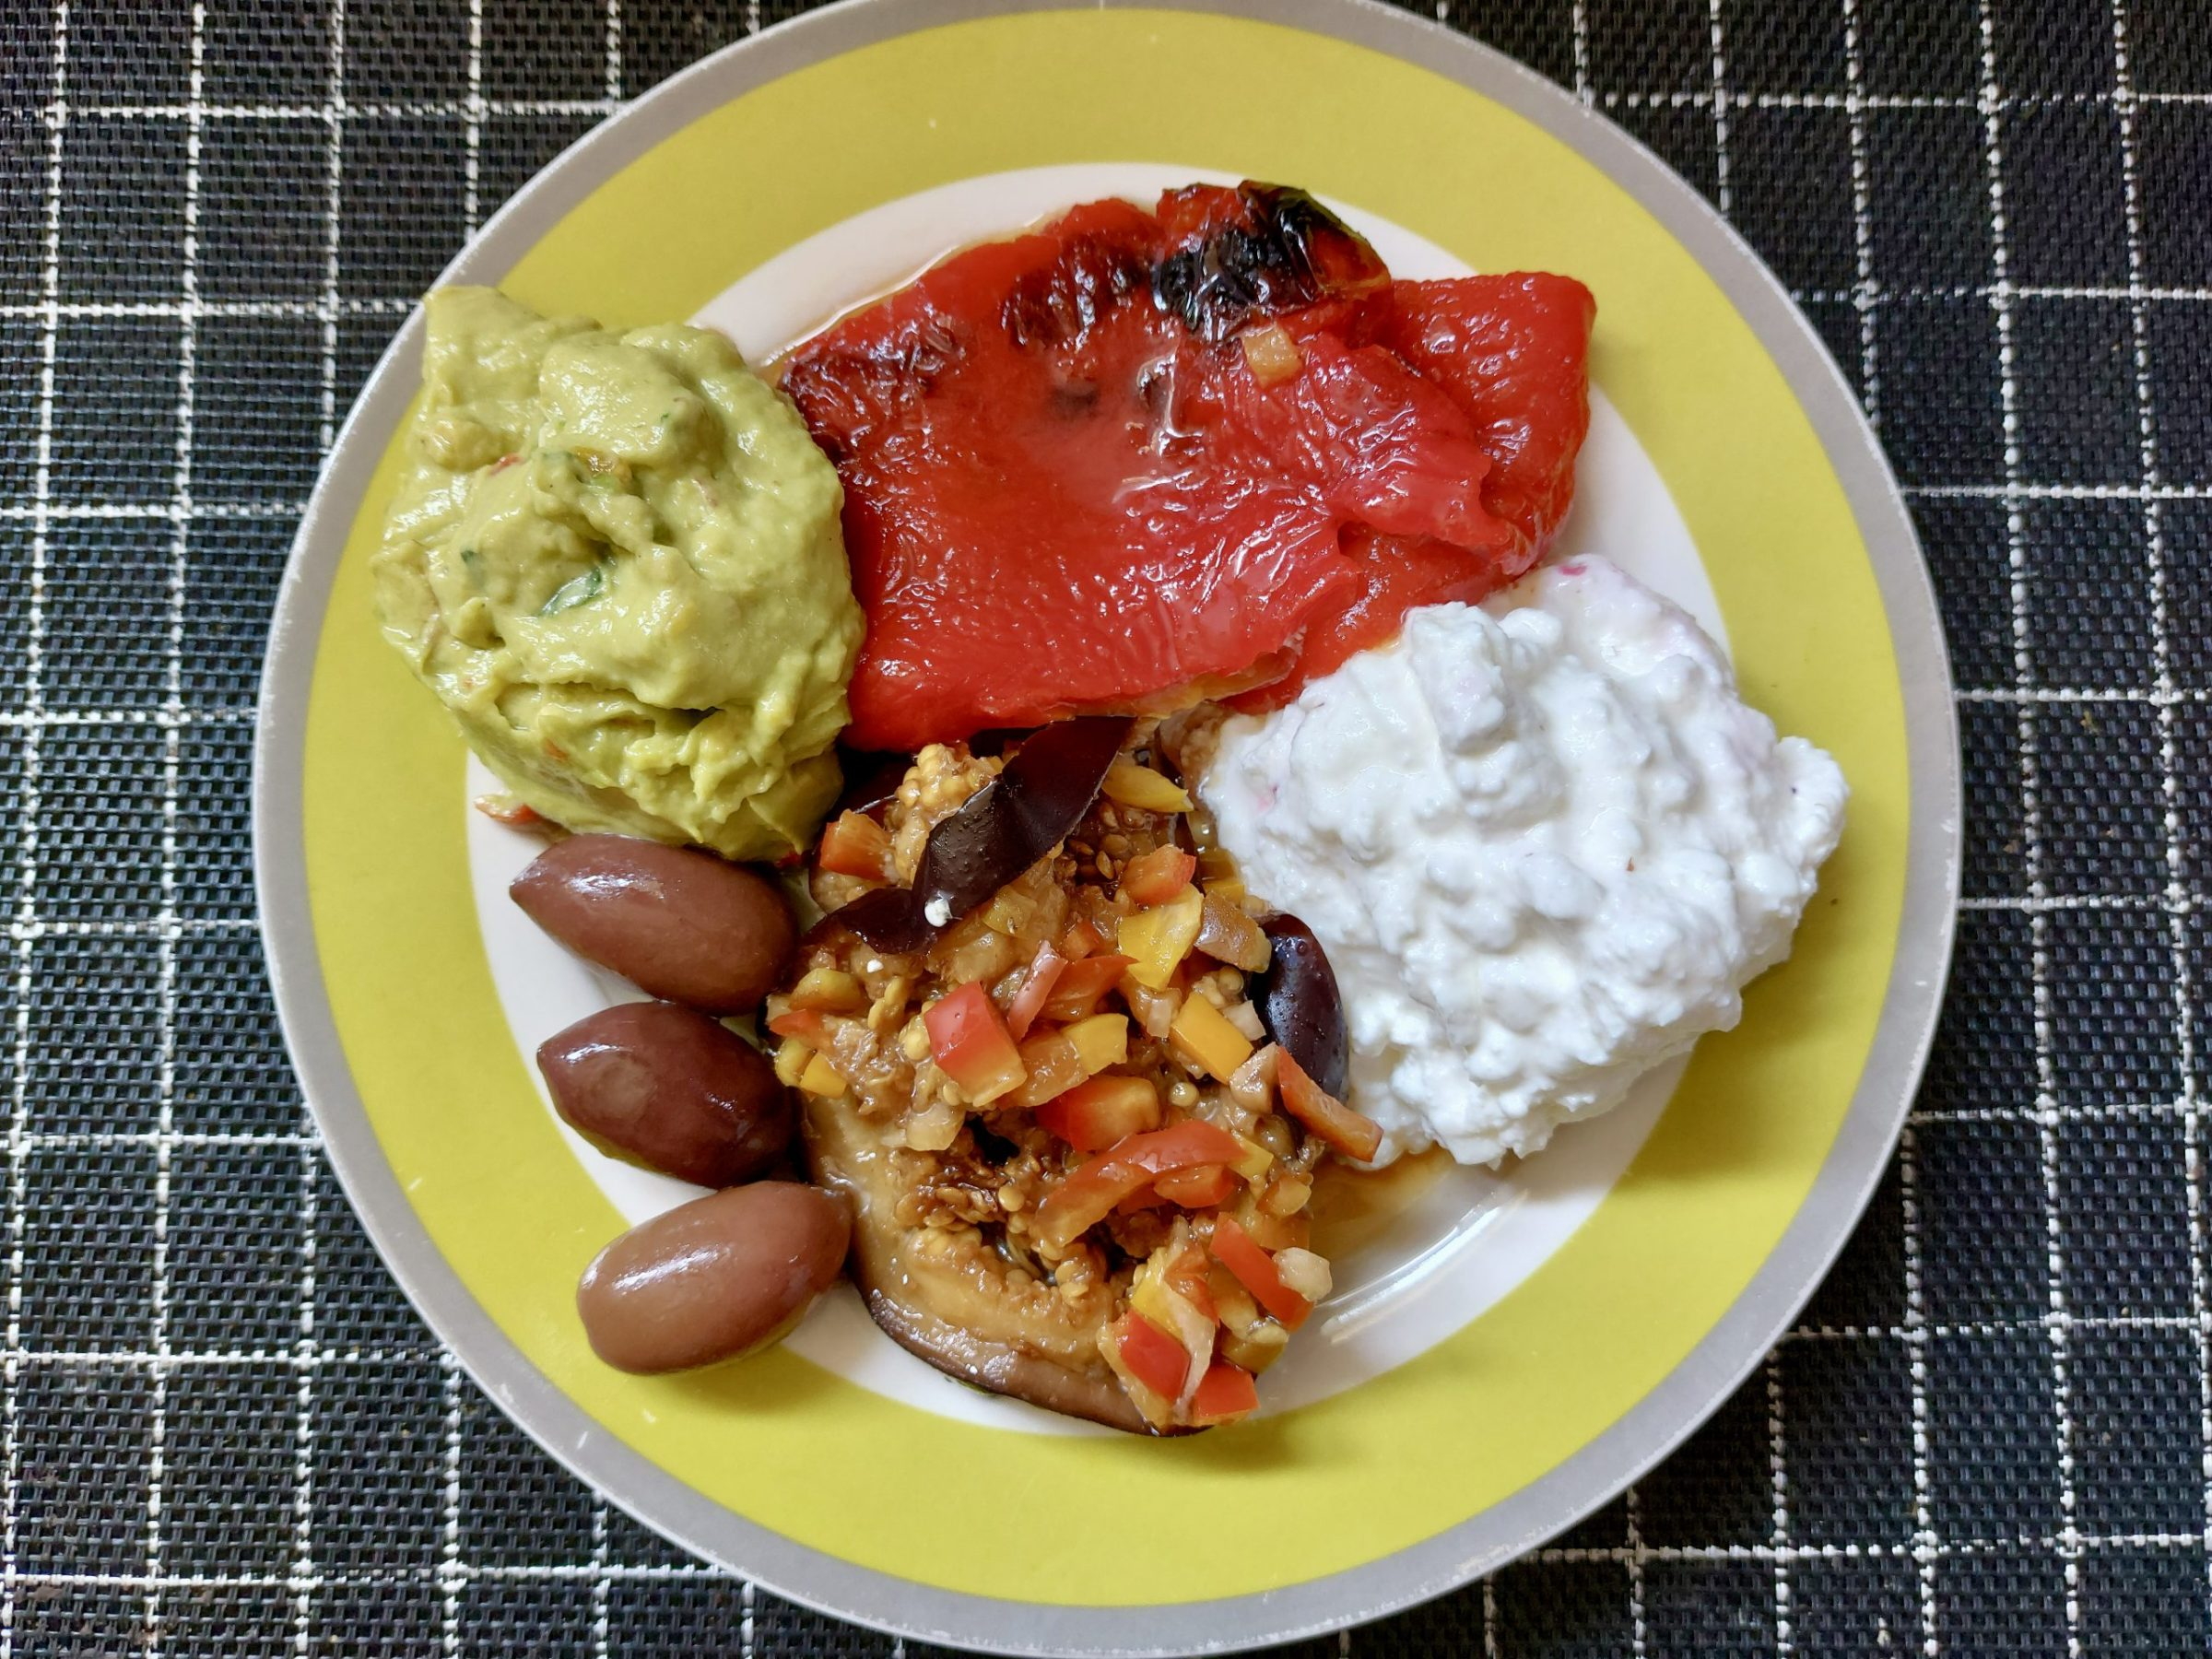 Catalàn Escalivada: Eggplants, peppers, and onions